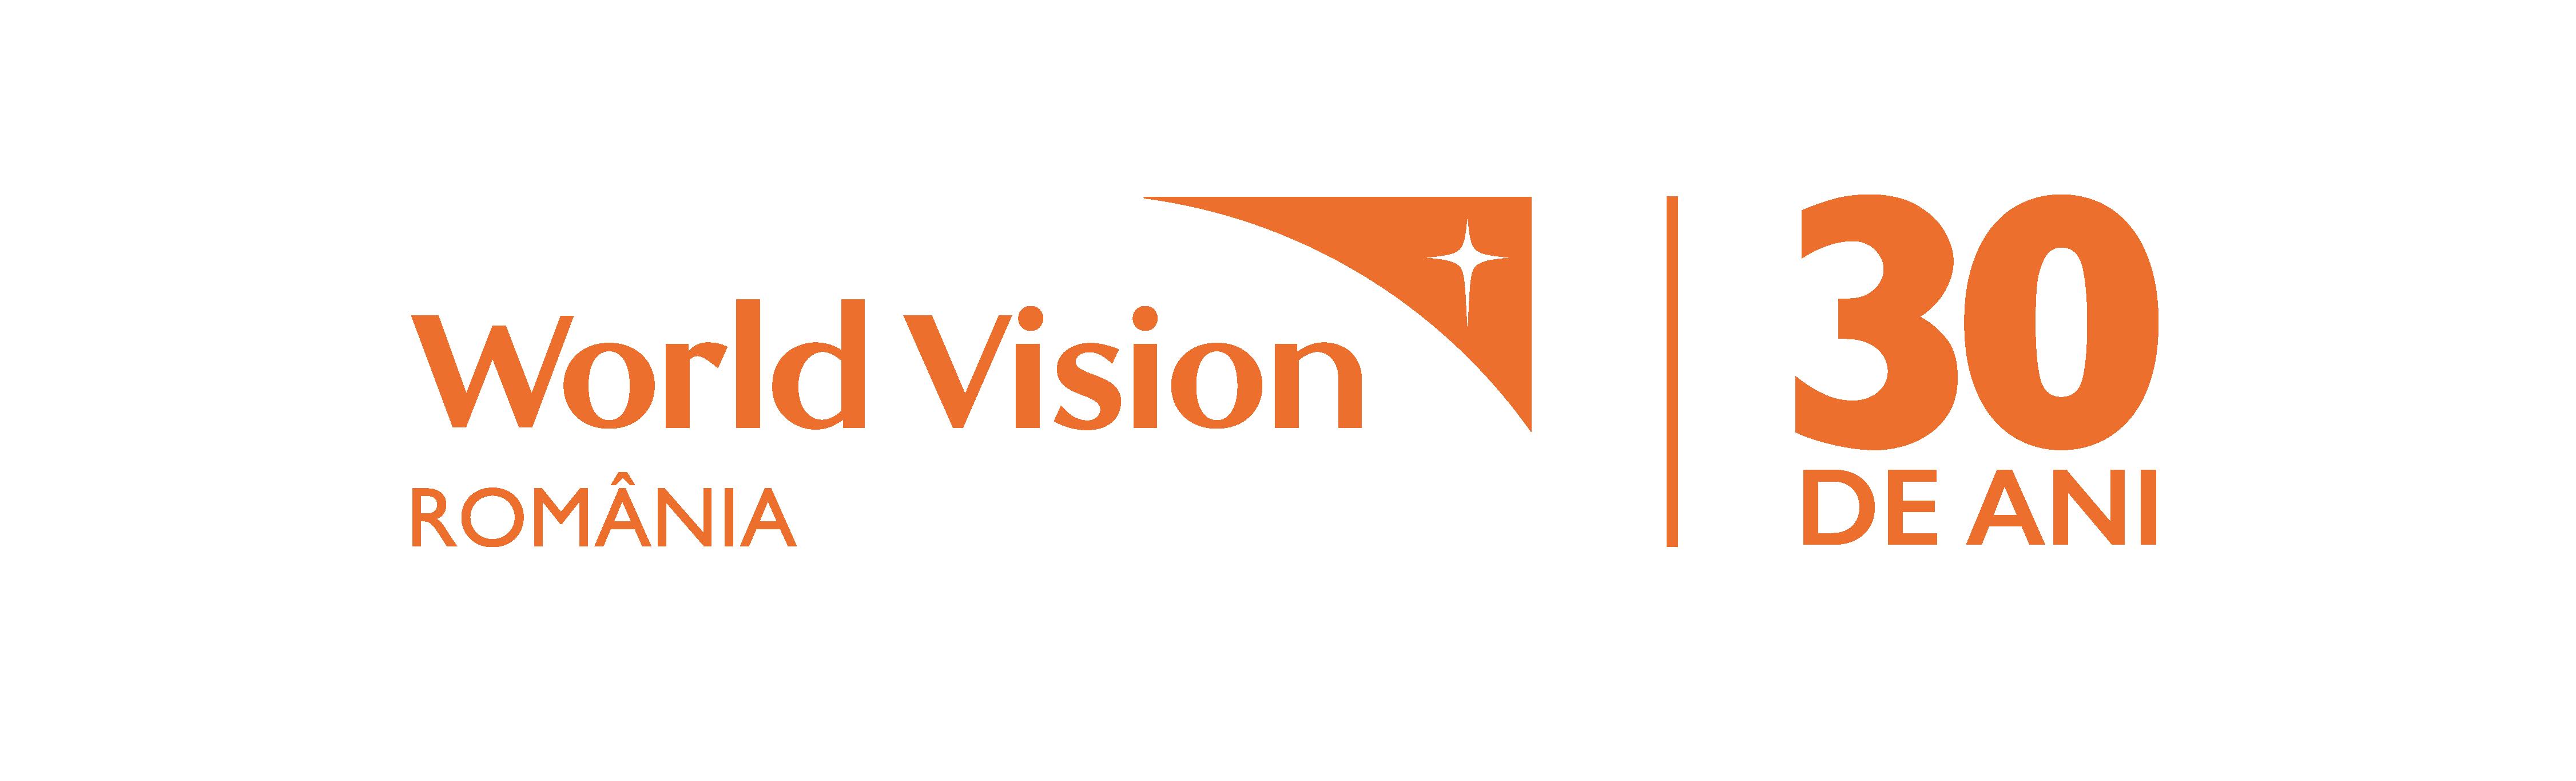 WV_30deani_logos-15